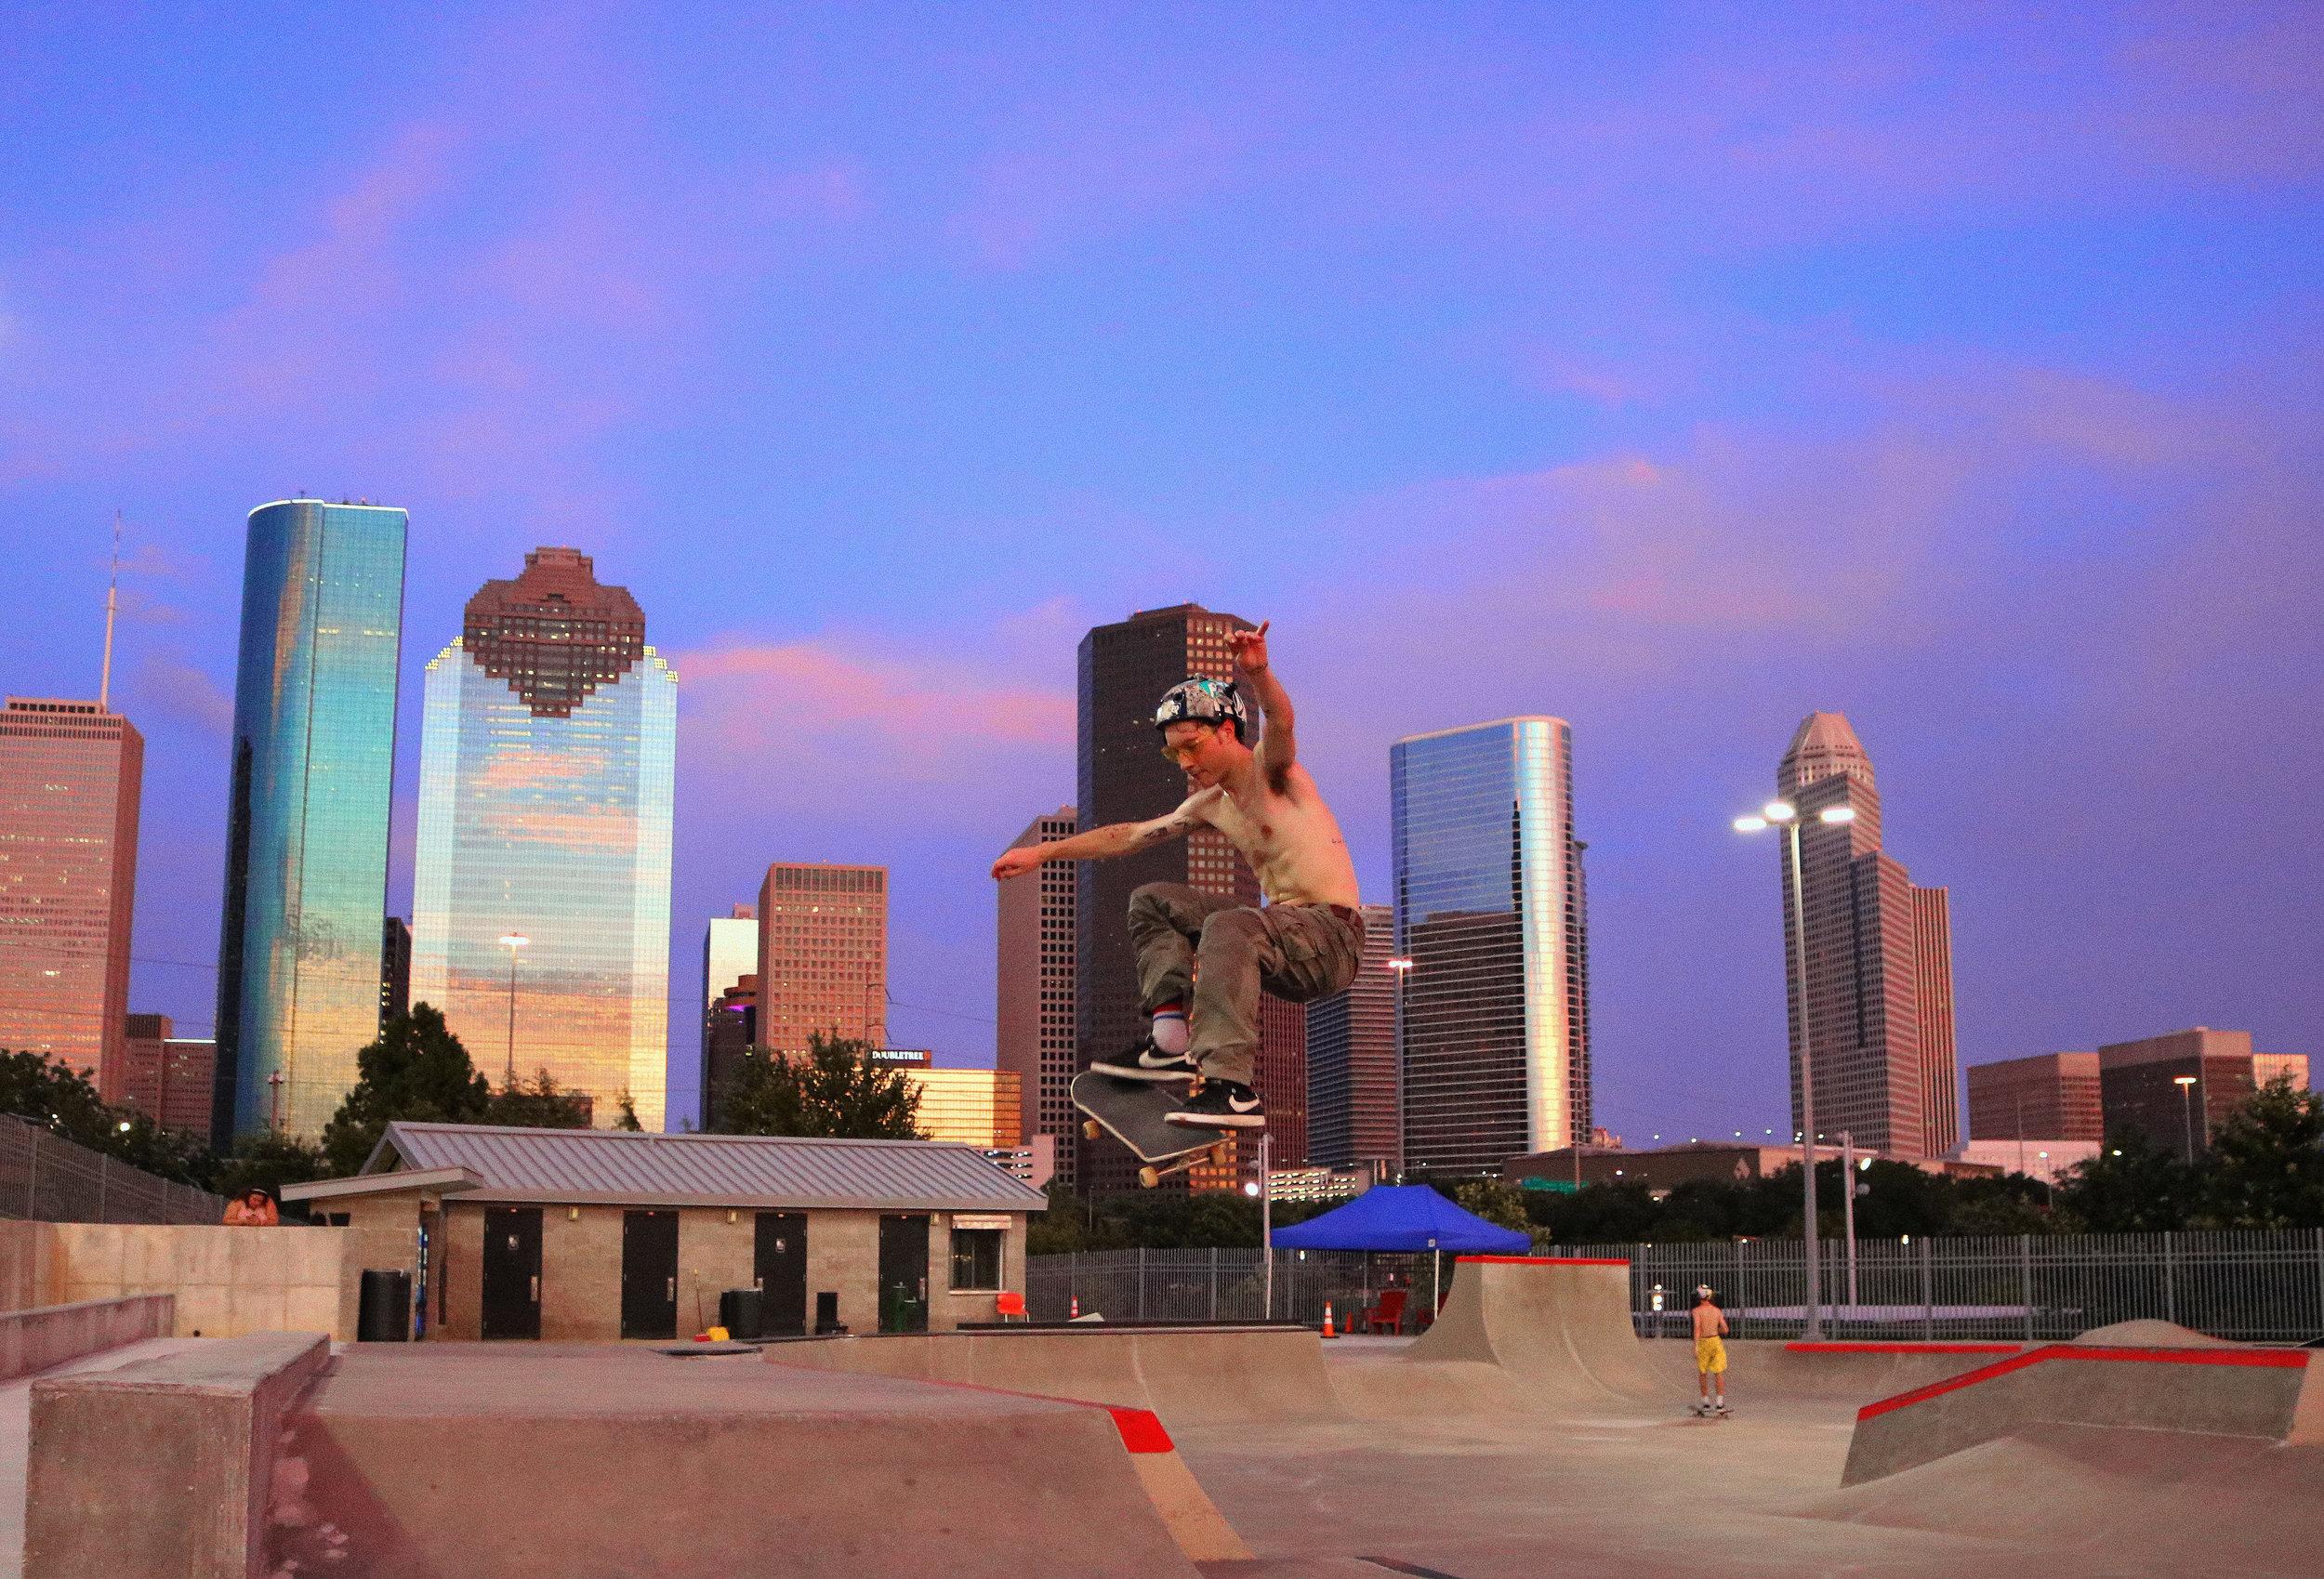 Rob Deutschman in front of the Houston skyline.